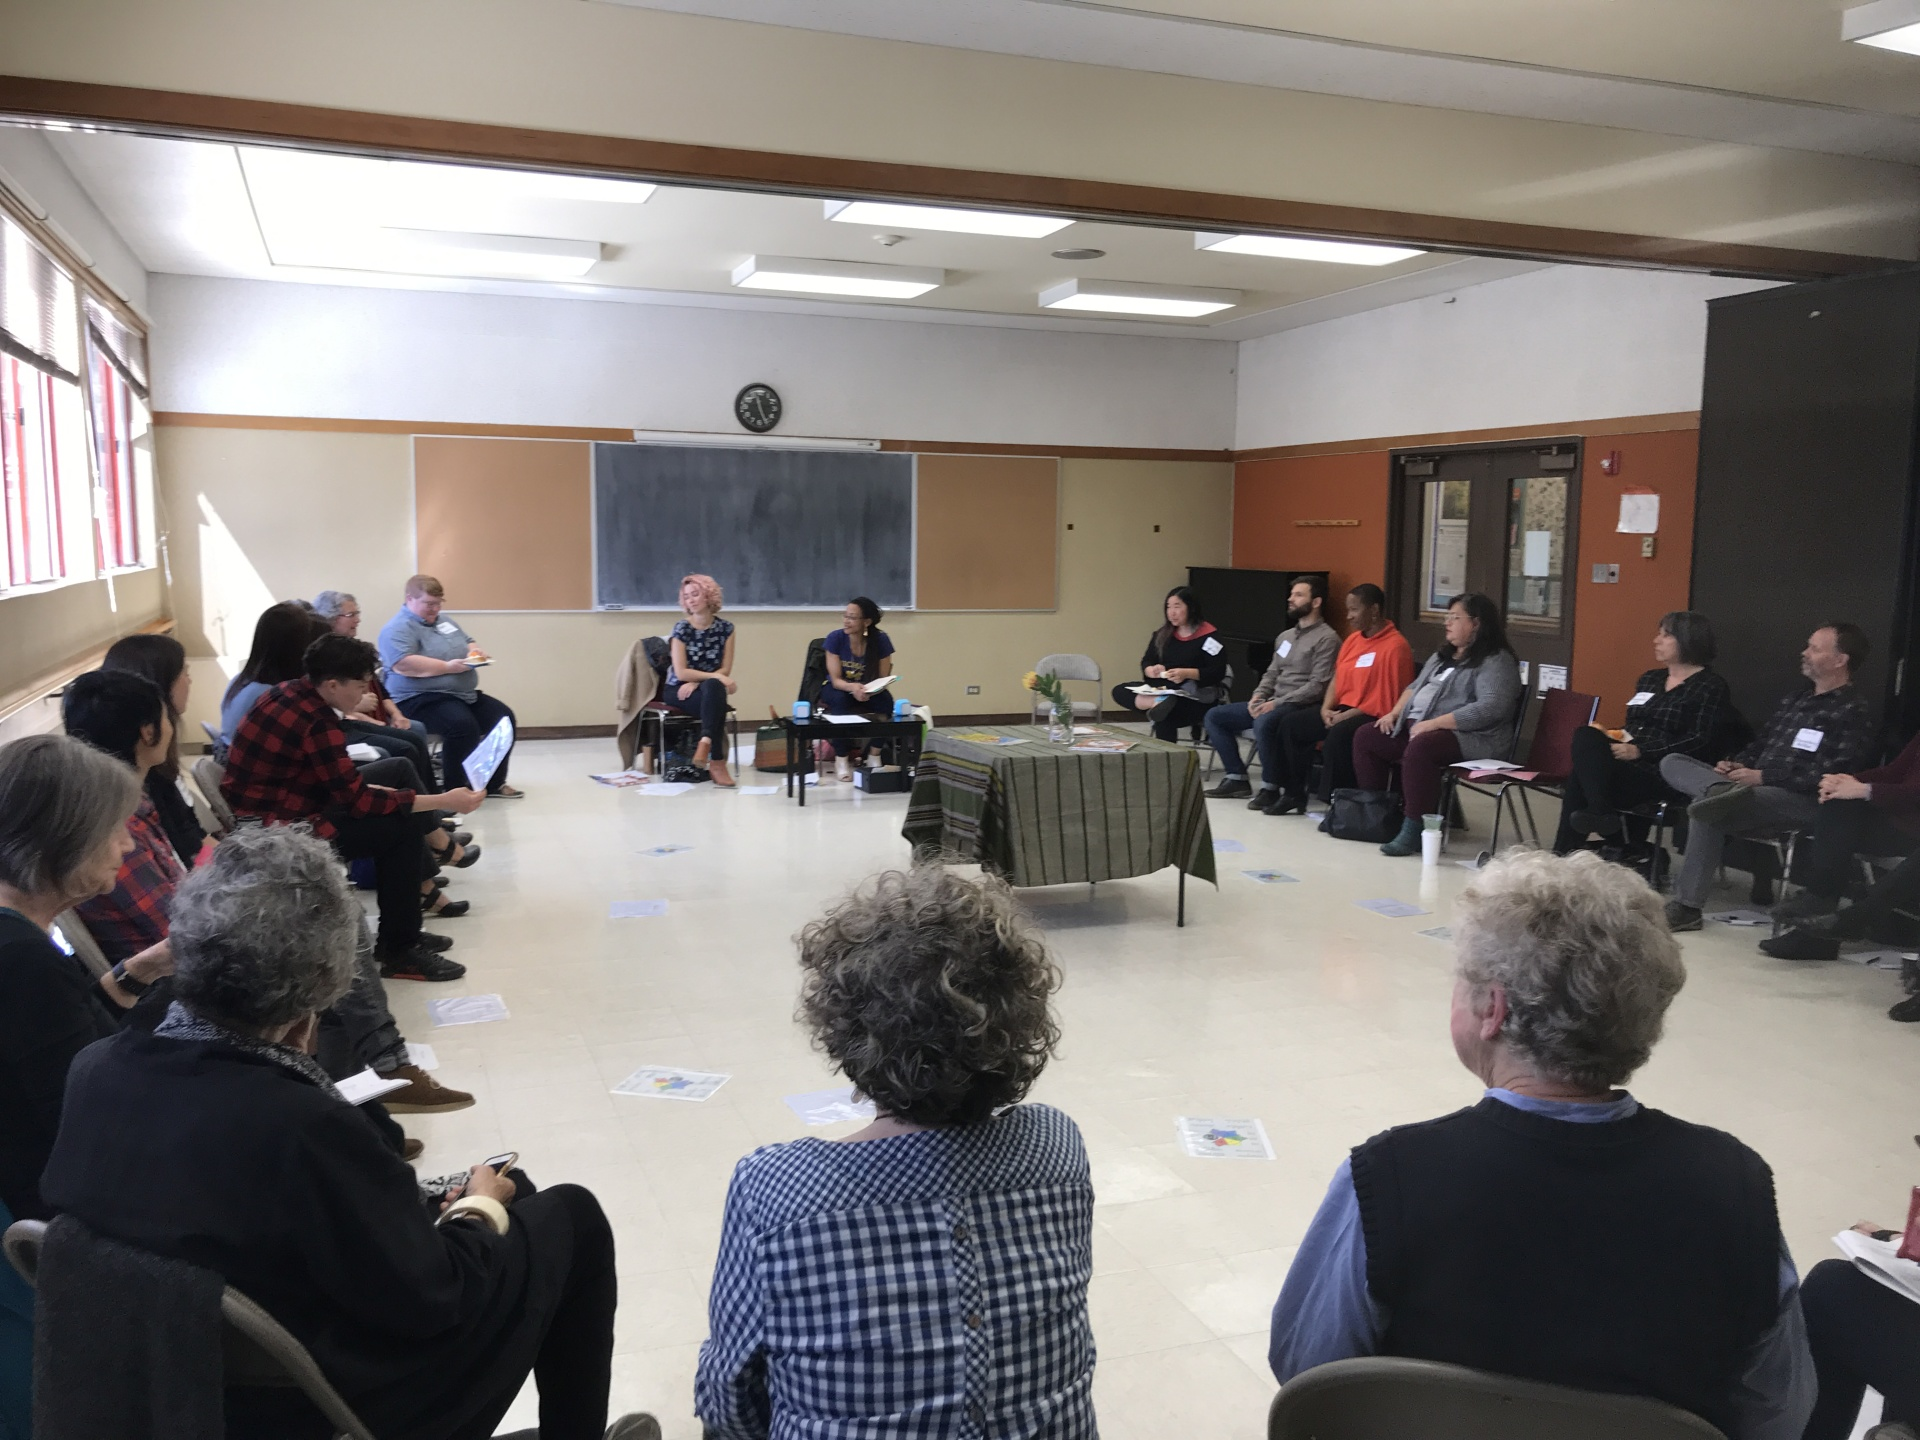 Workshop Recap: Developing Your Intersectional Social Justice Practice